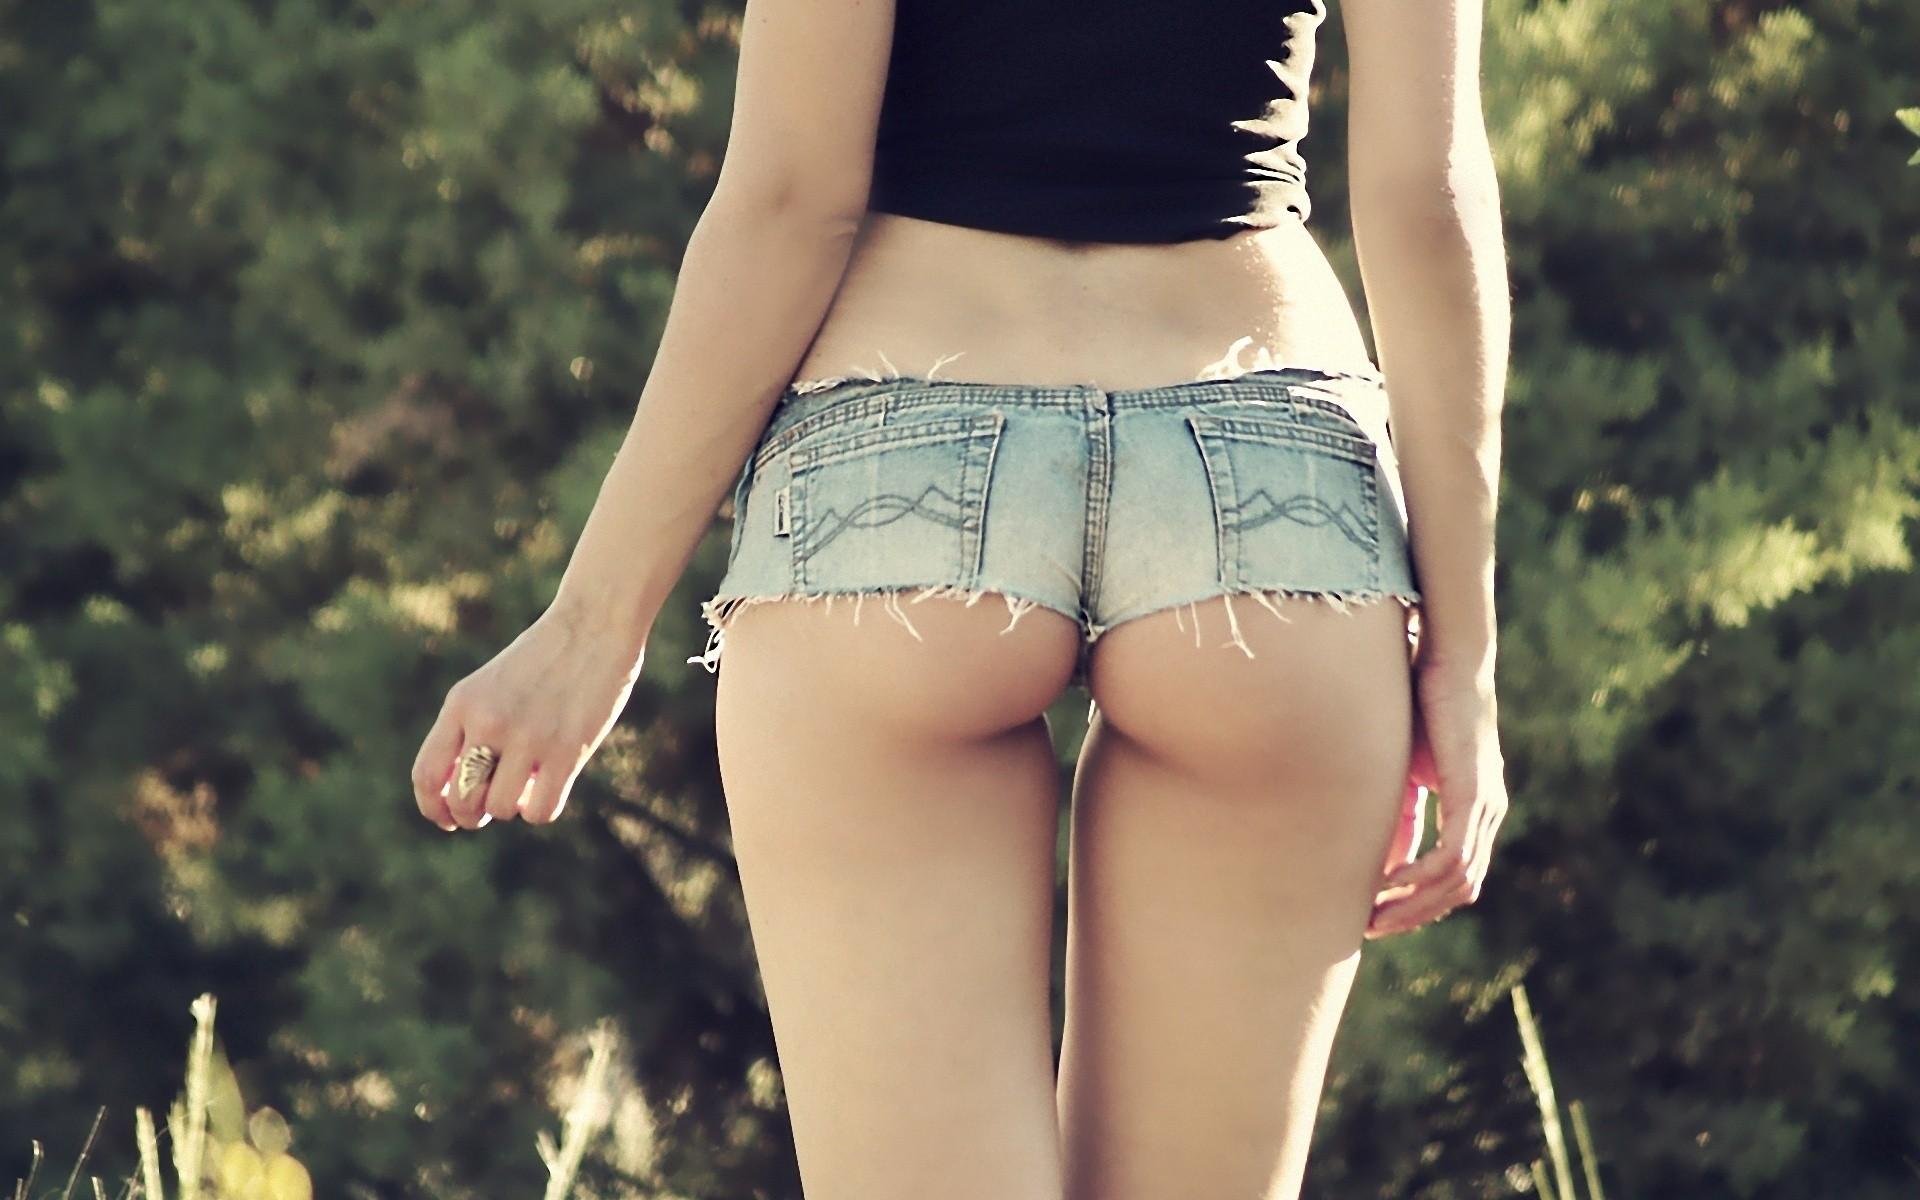 Sexual subjectivity among adolescent girls